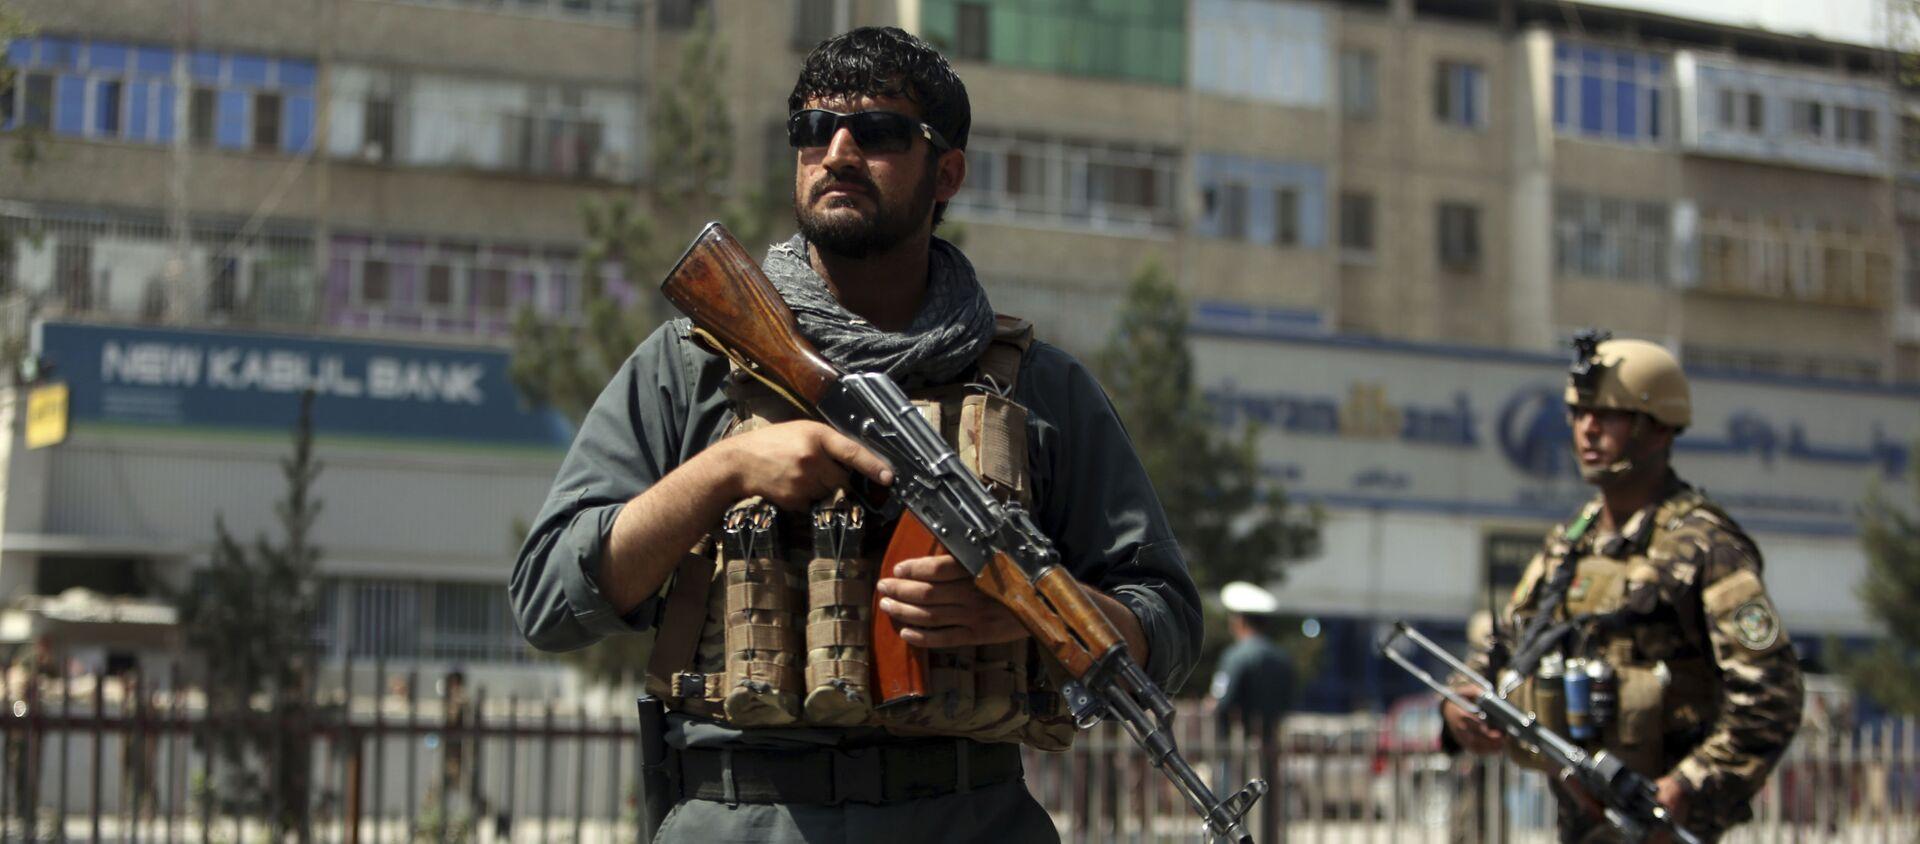 Nhân viên an ninh Afghanistan ở Kabul - Sputnik Việt Nam, 1920, 10.08.2021